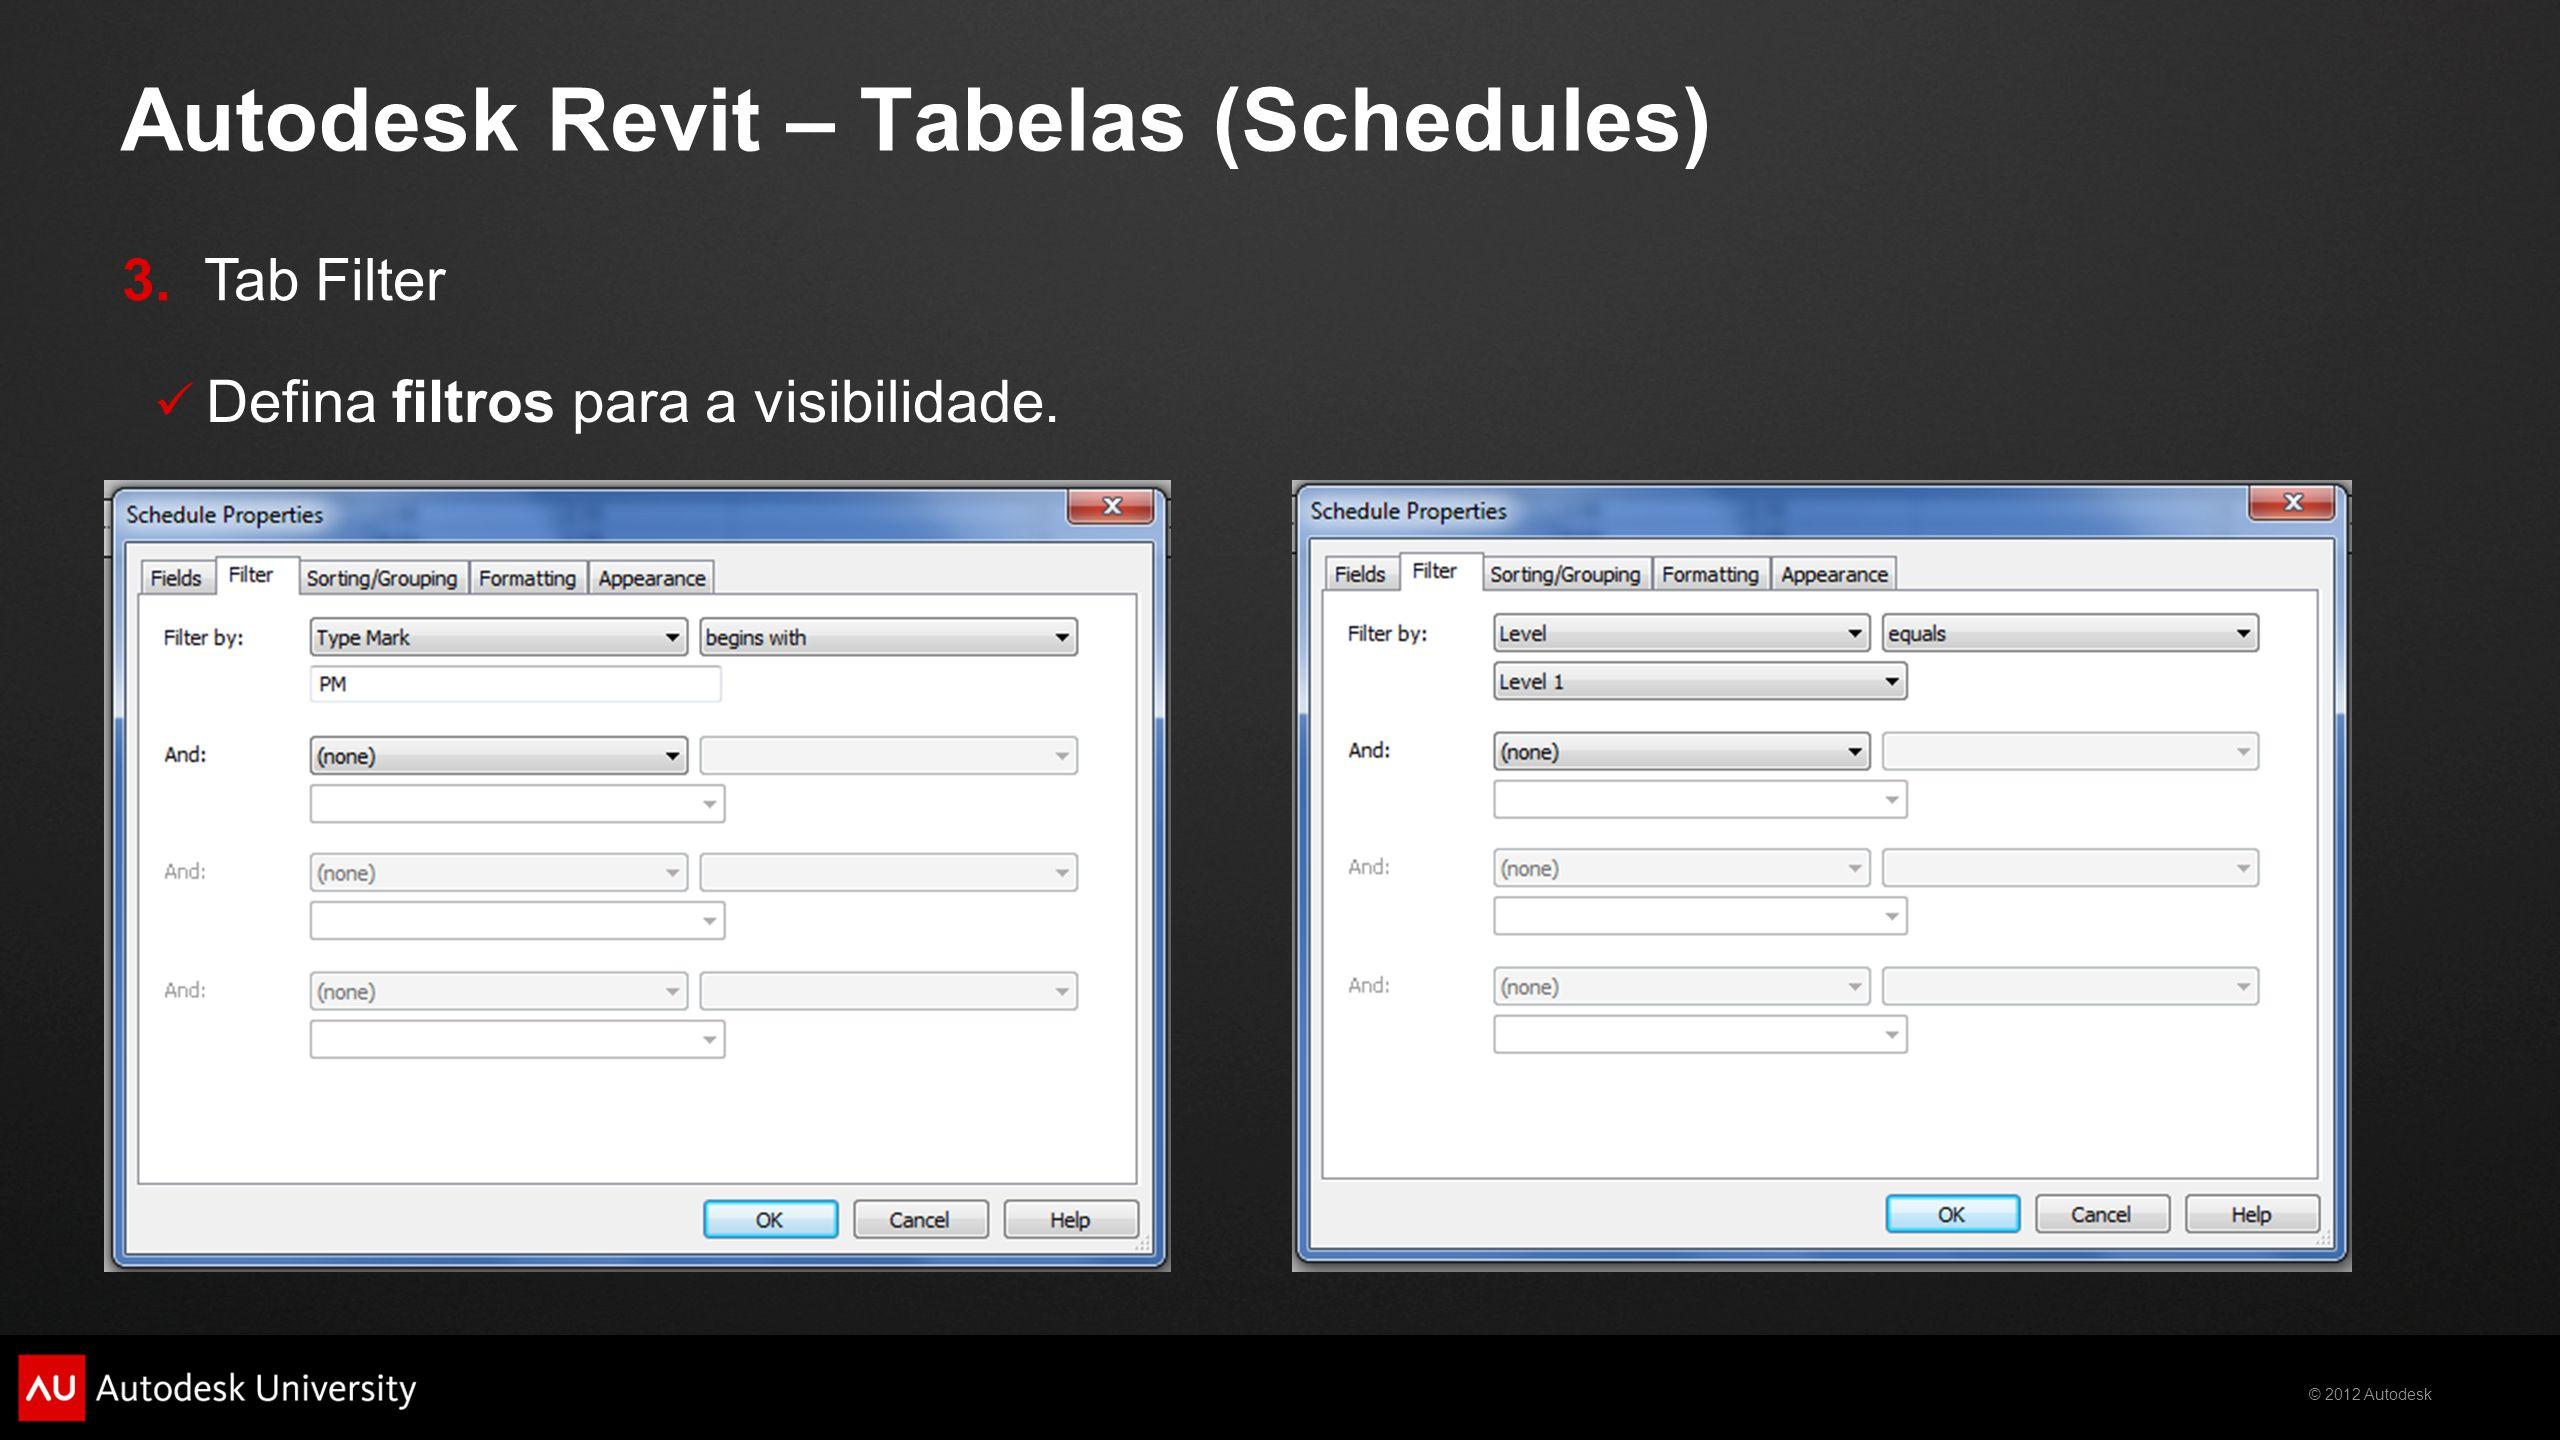 © 2012 Autodesk Autodesk Revit – Tabelas (Schedules)  Defina filtros para a visibilidade. 3. Tab Filter